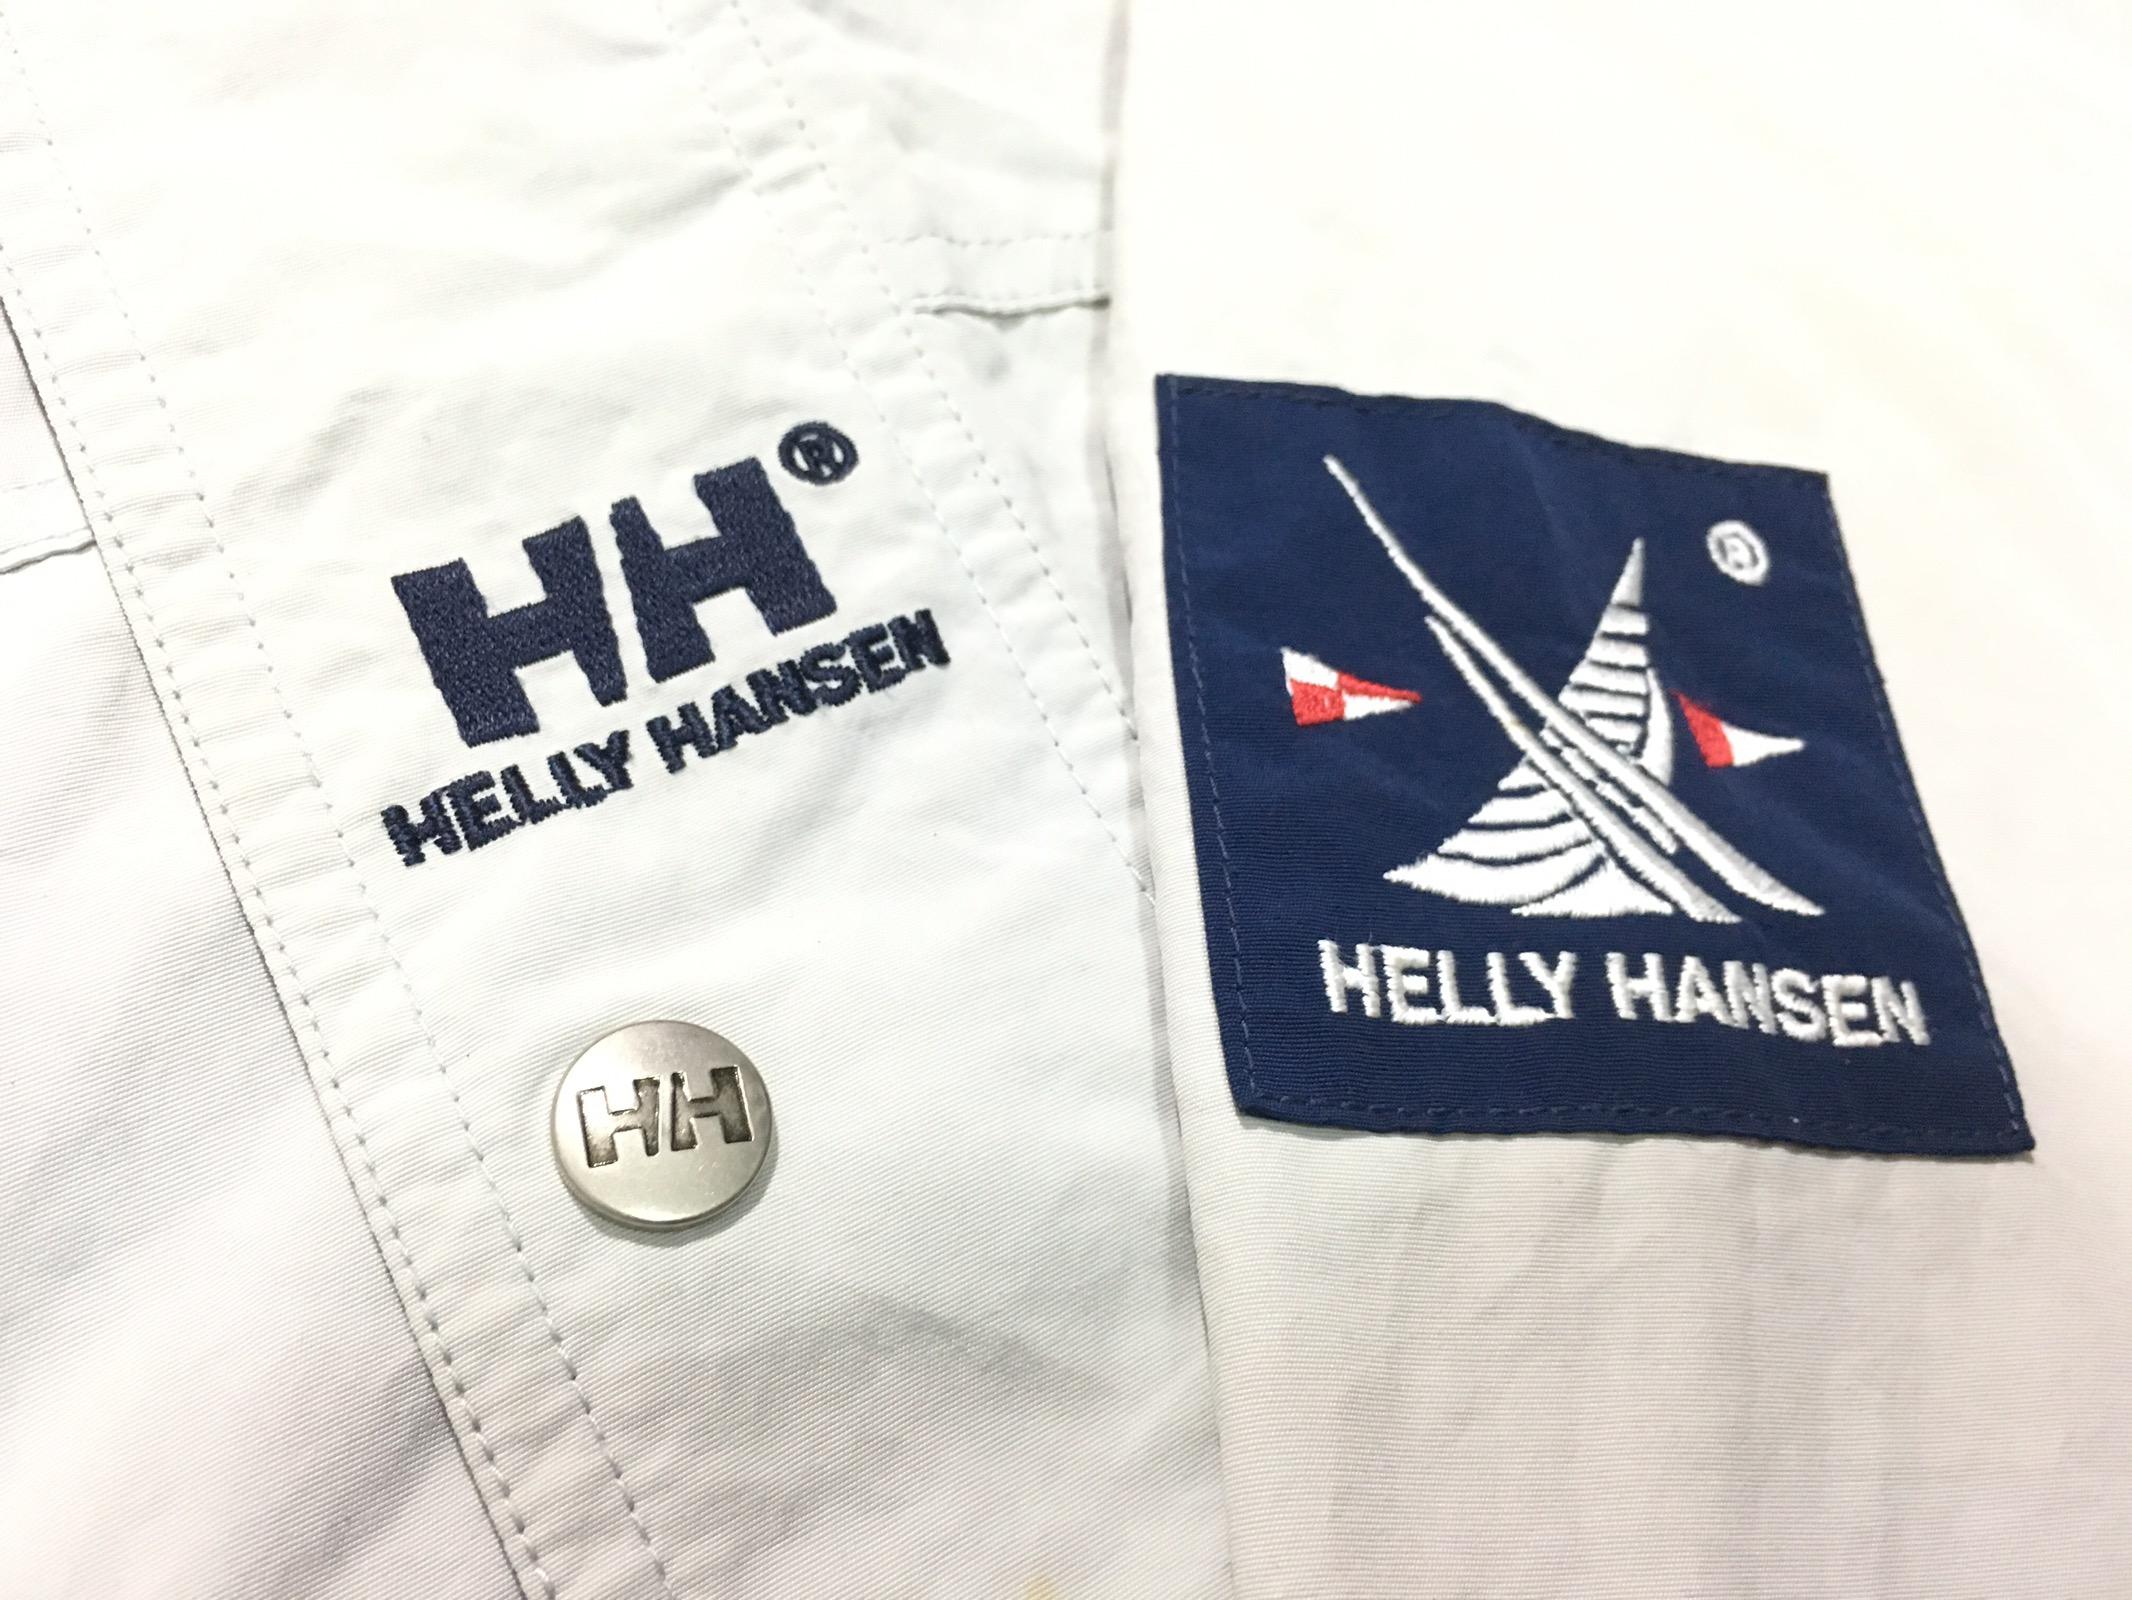 b764ddc6b Helly Hansen Vintage Helly Hansen Twin Sails Jacket Hooded ...